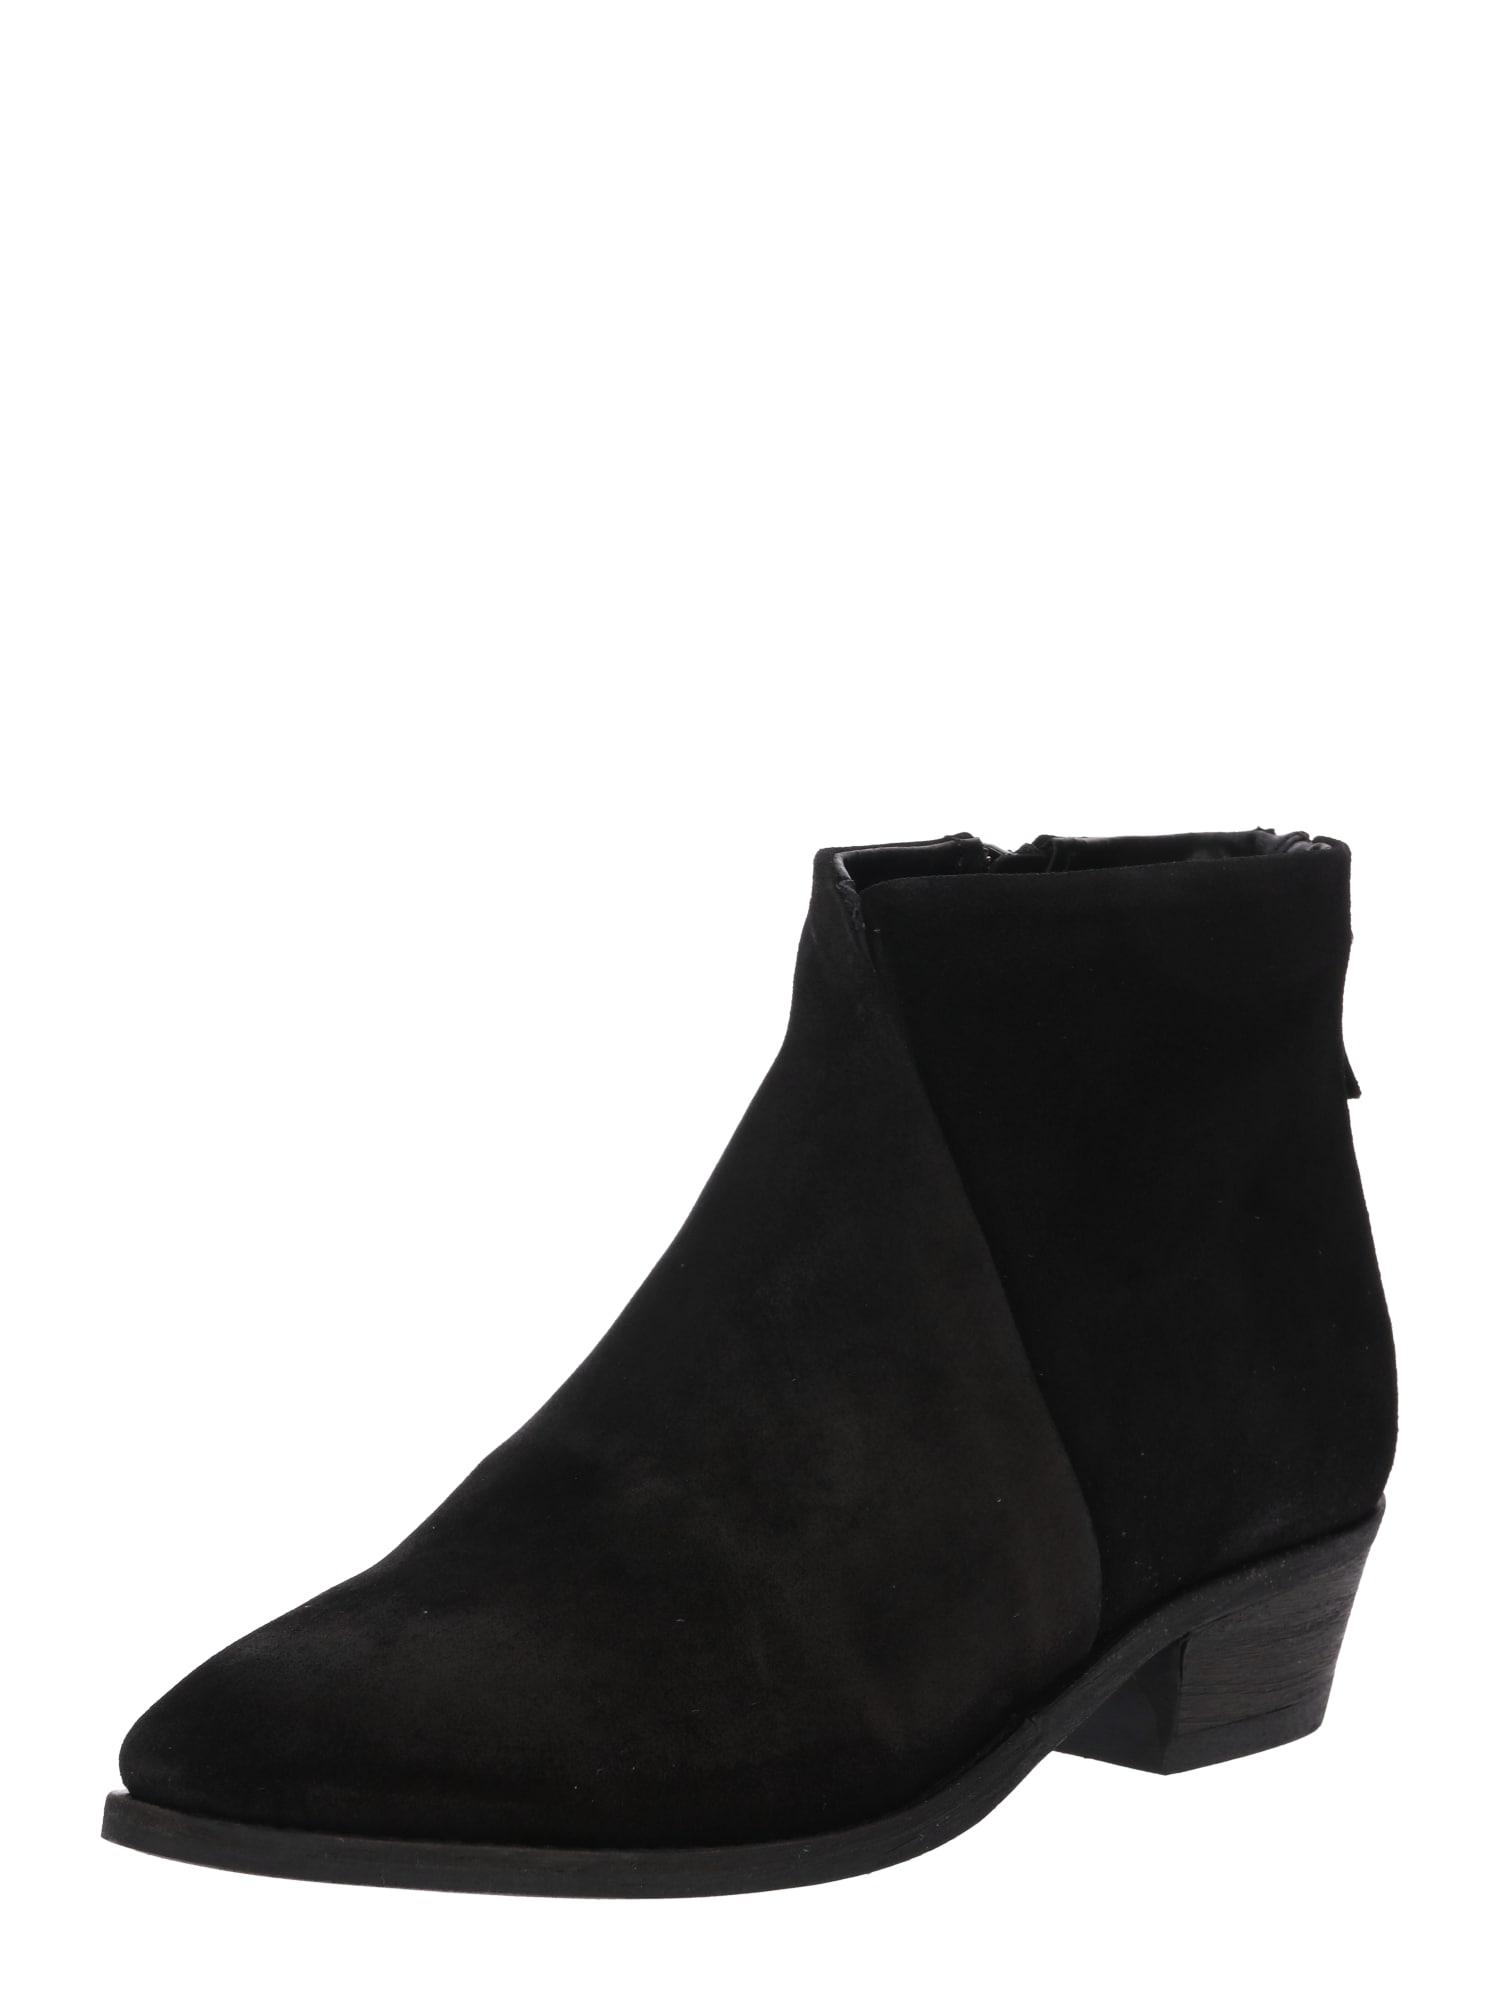 Ankle Boot 'Sara' | Schuhe > Boots > Sonstige Boots | Schwarz | PAVEMENT